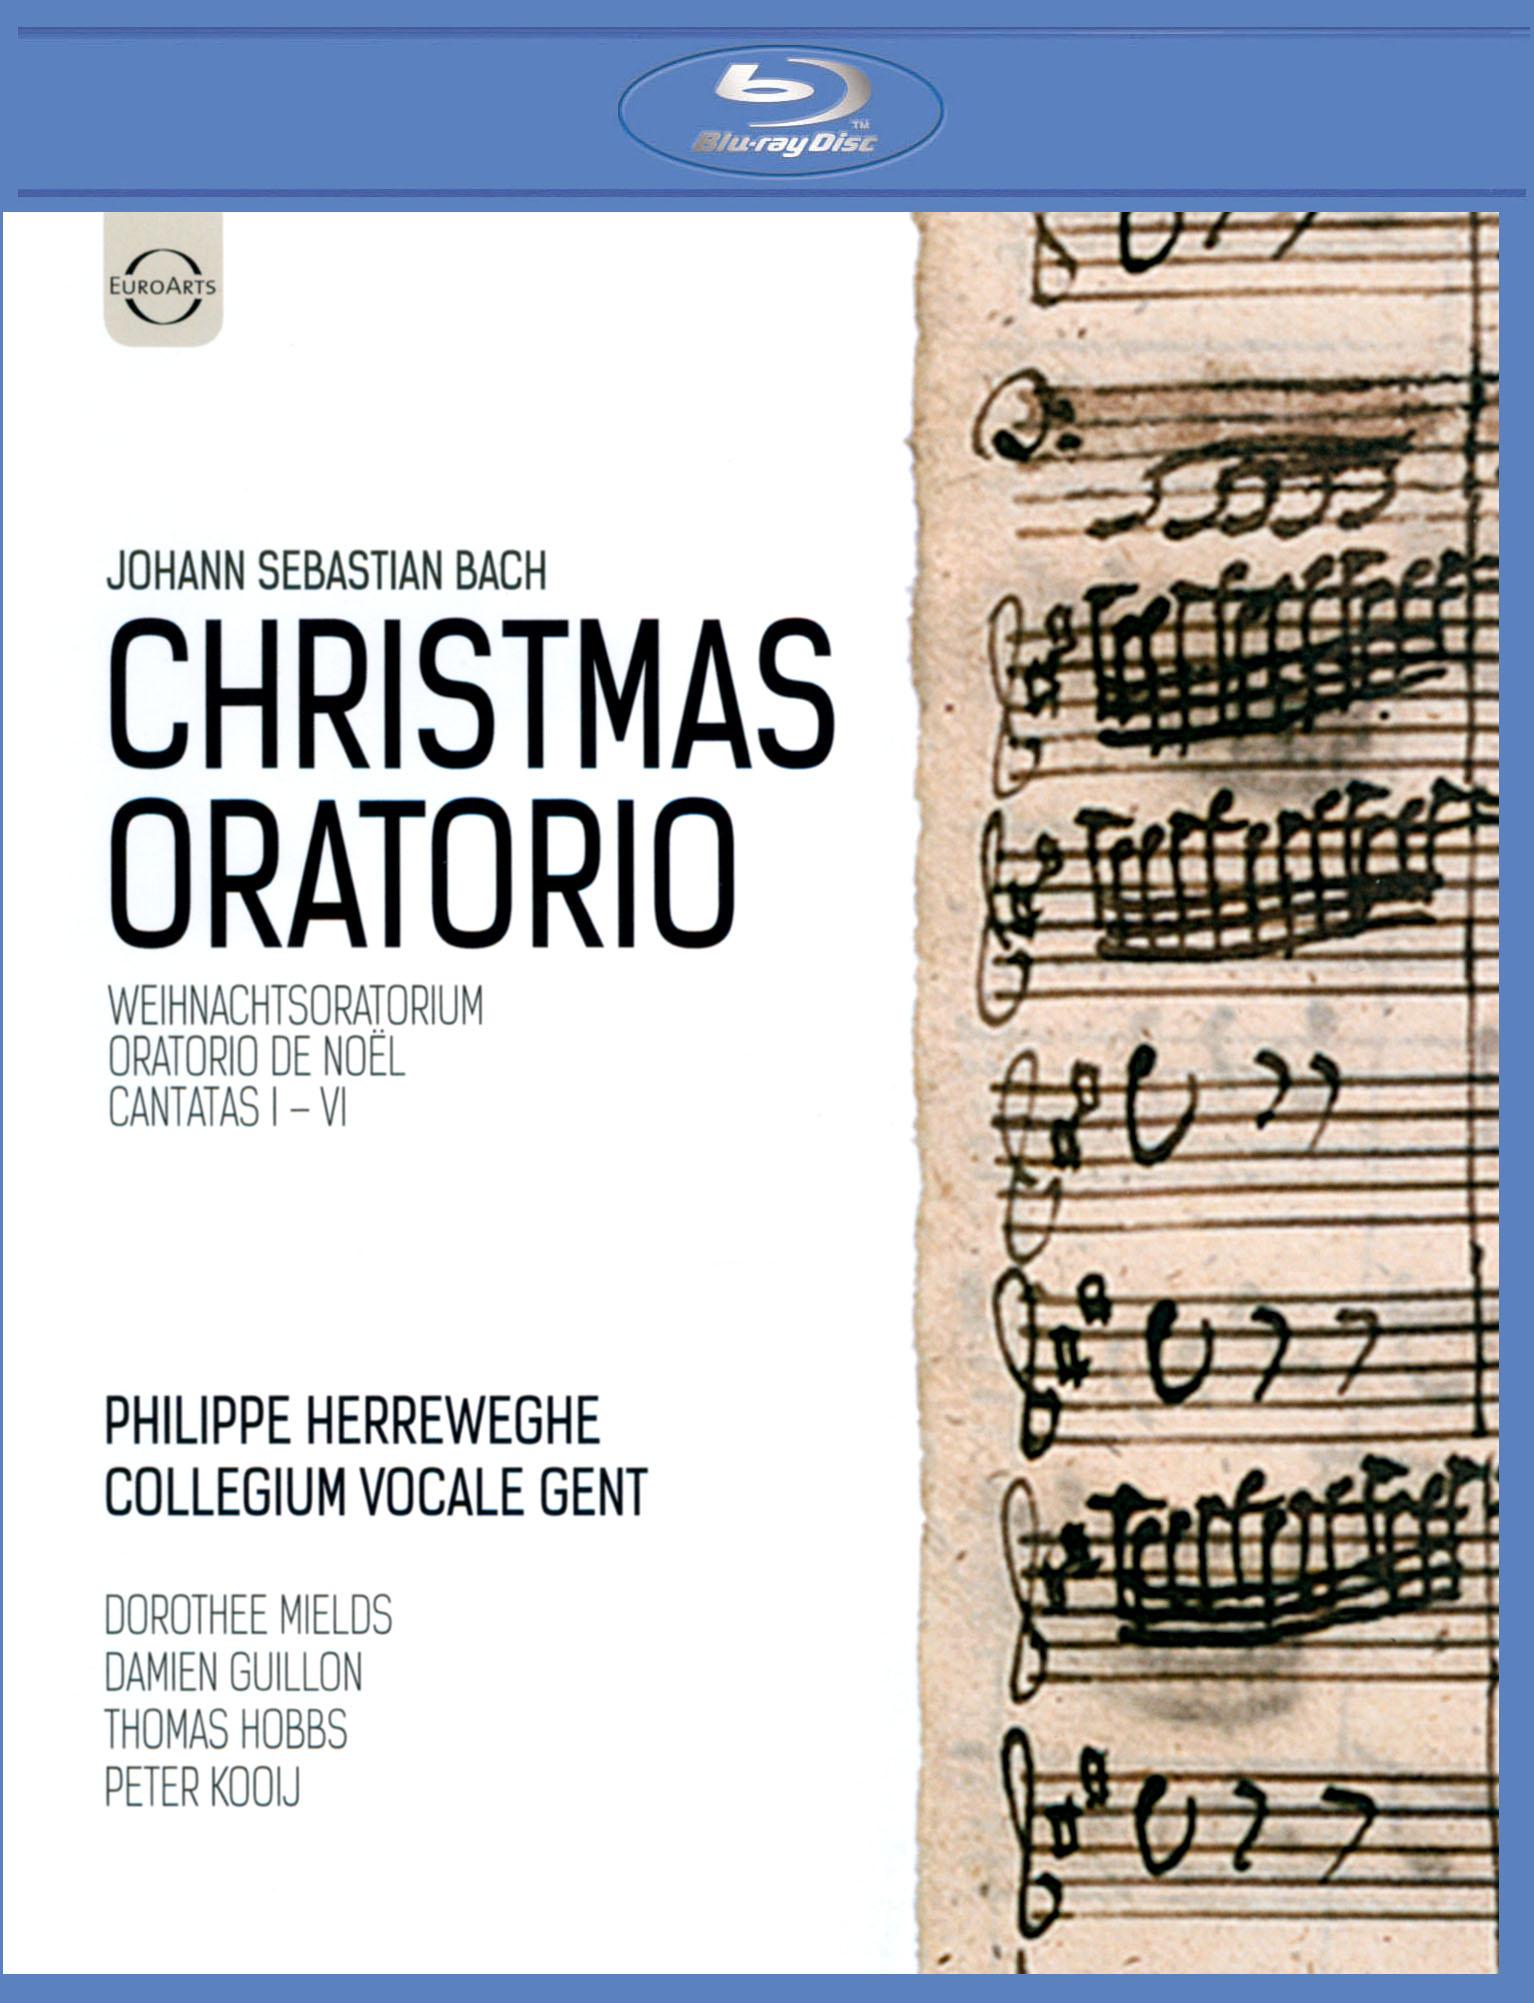 Philippe Herreweghe/Collegium Vocale Gent: Johann Sebastian Bach - Christmas Oratorio